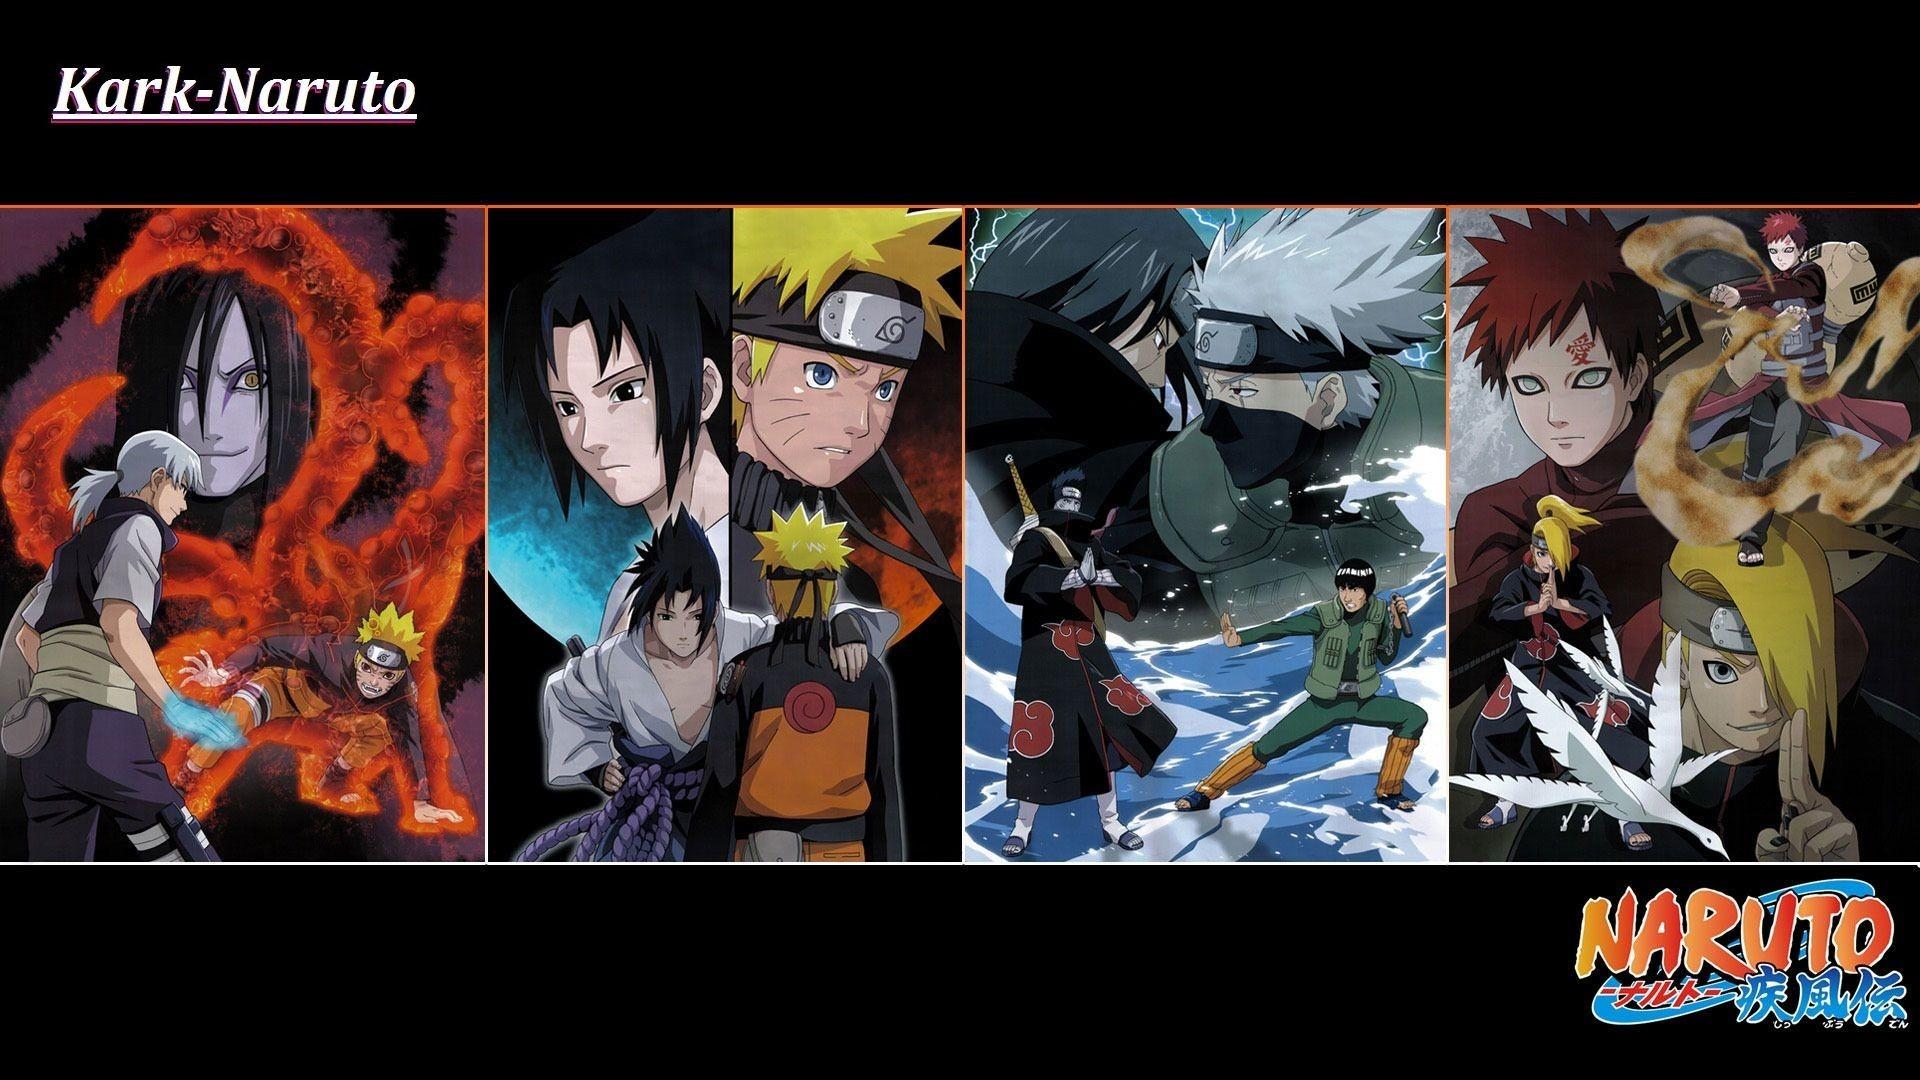 Full HD p Naruto Wallpapers HD, Desktop Backgrounds 1600×1200 Wallpaper  Naruto Shippuden (